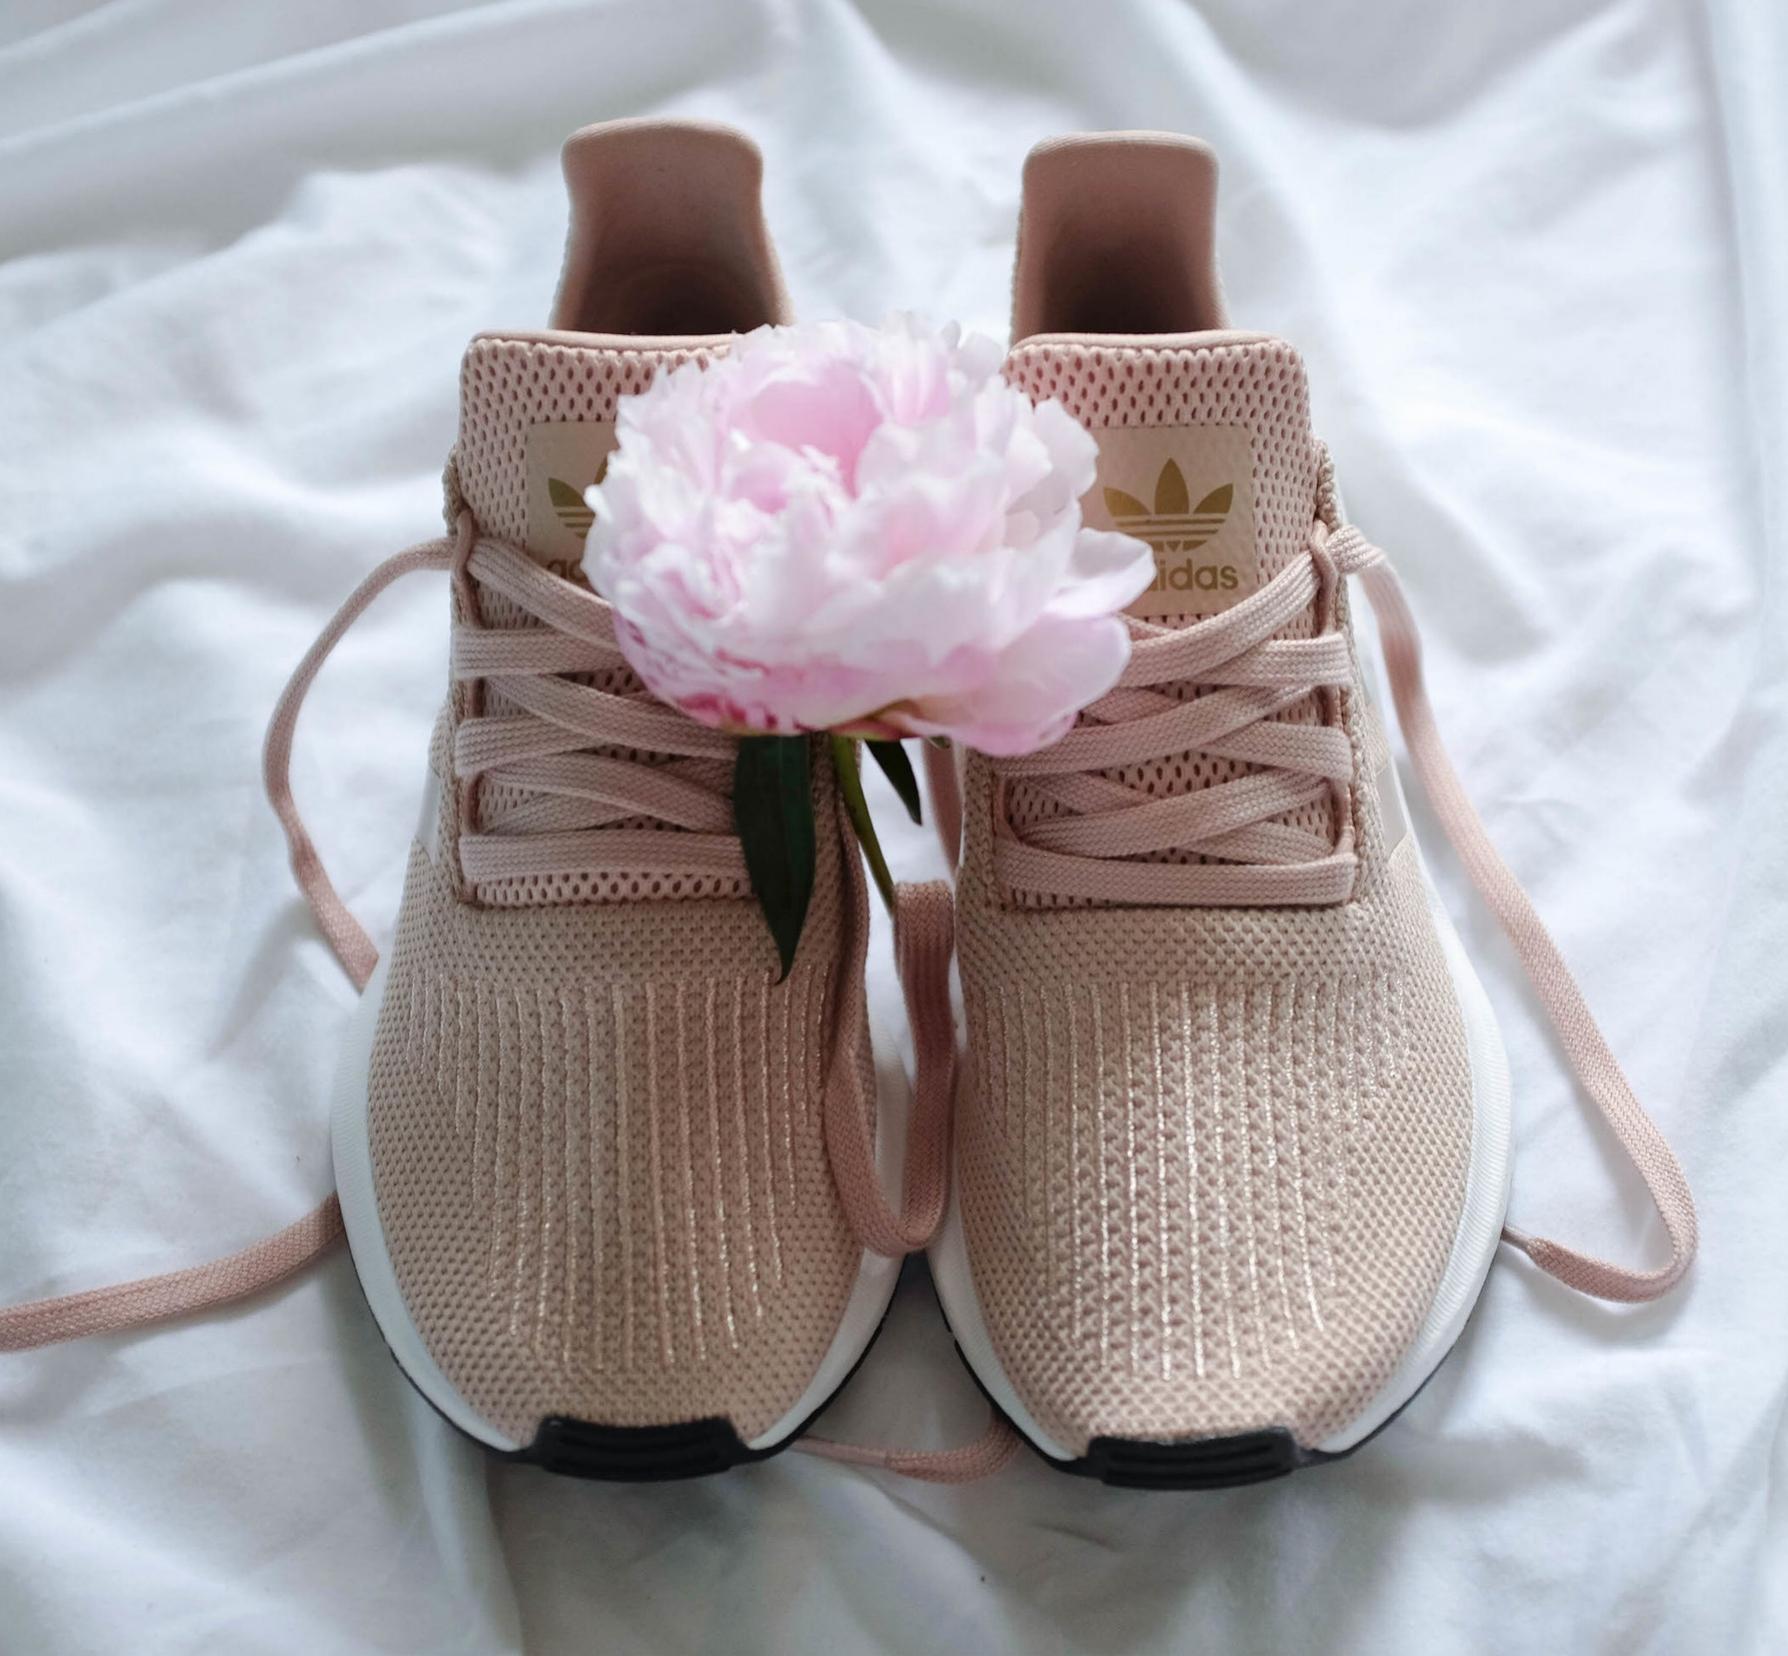 adidas originals swift run in dust rose, nezuki, milleNnial pink, Peony, pink sneakers, pink trainers, adidas, adidas swift run, adidas australia, image by vanessa collars